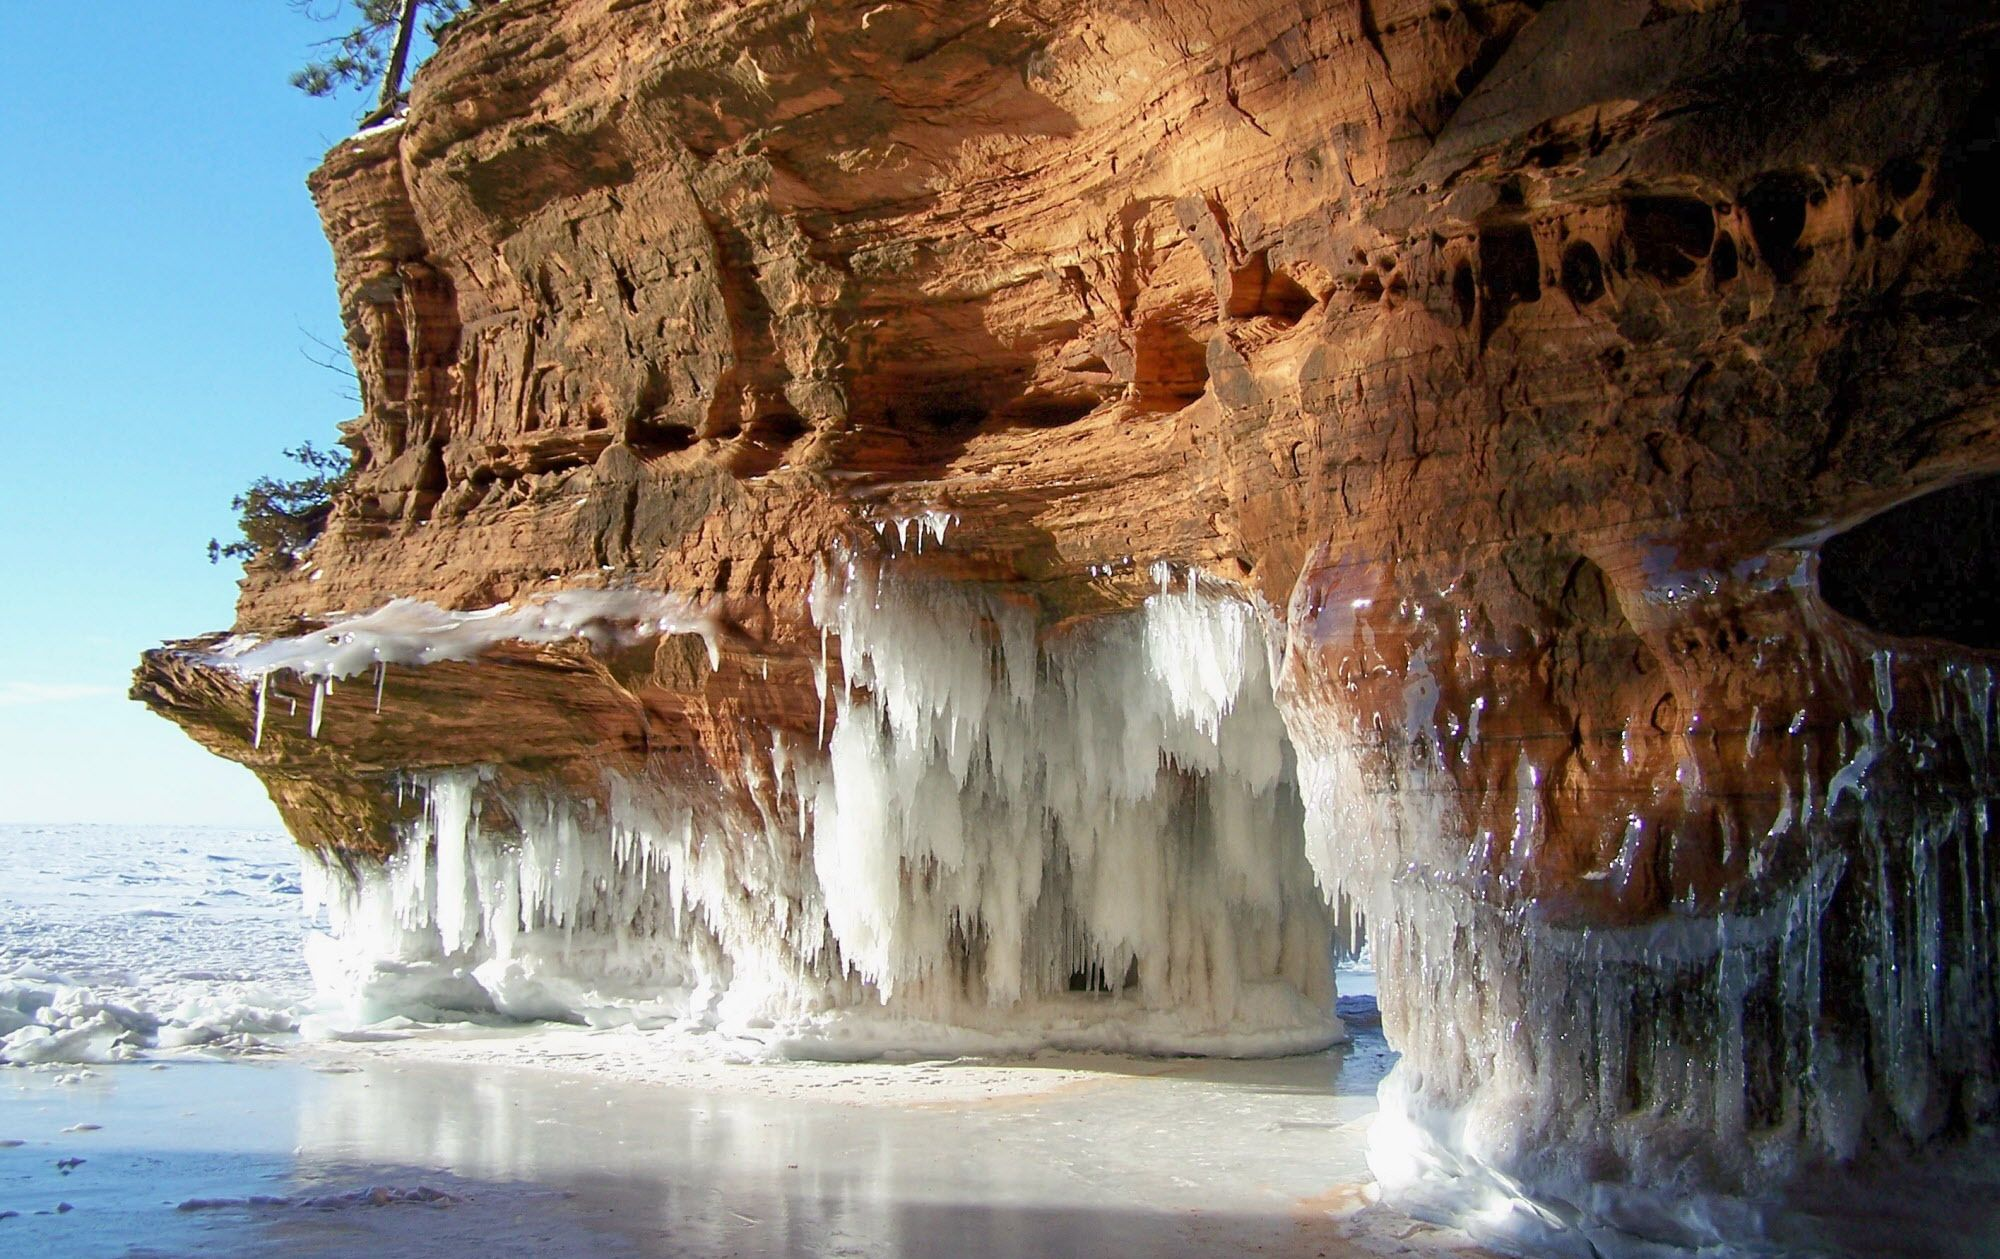 Apostle Islands National Lakeshore 39 S Mainland Sea Caves 1 Mile Trek Across Frozen Lake To